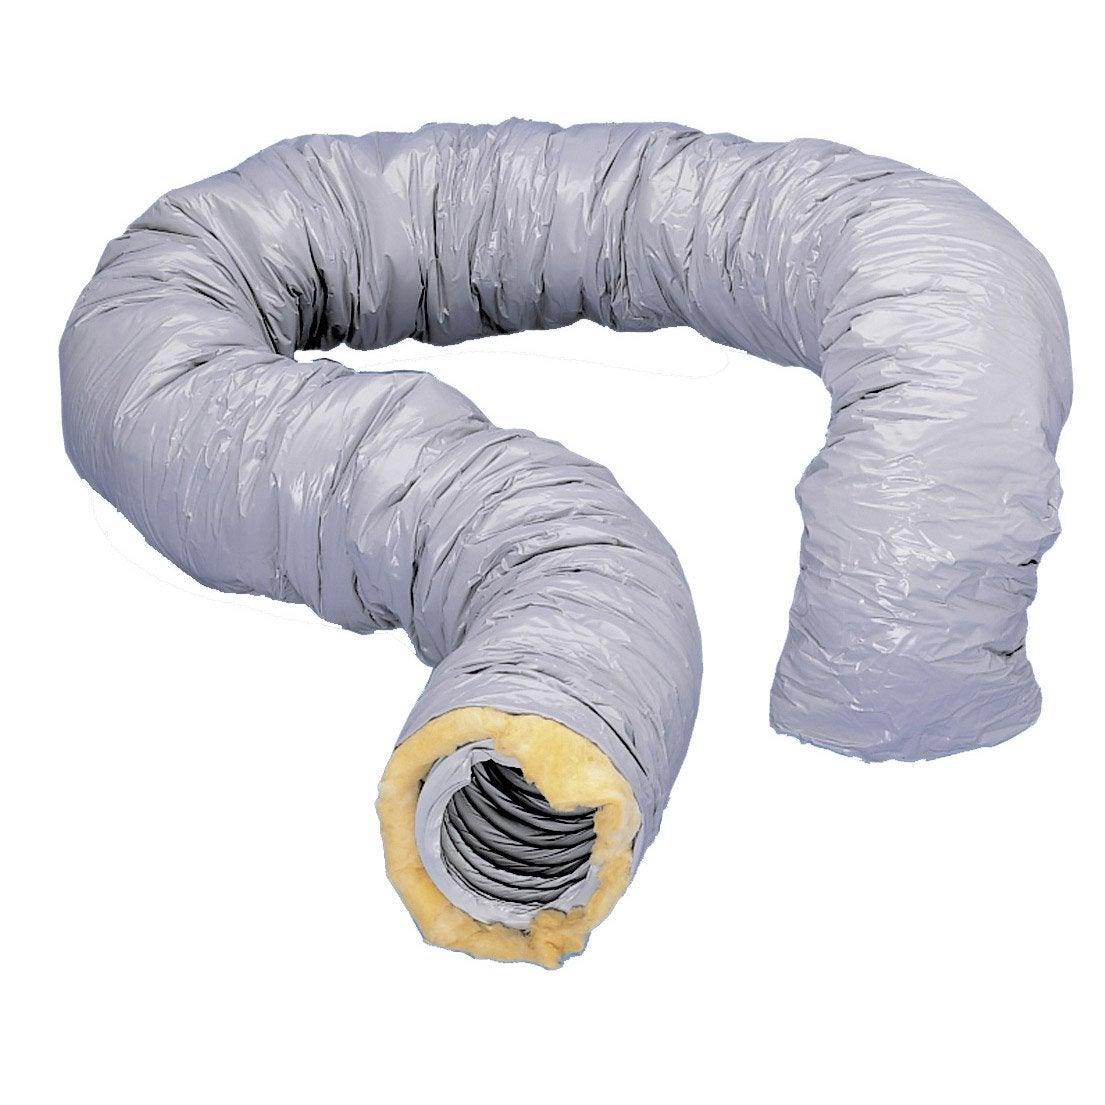 Comment raccorder tuyau vmc - Tuyau polyethylene 25 leroy merlin ...